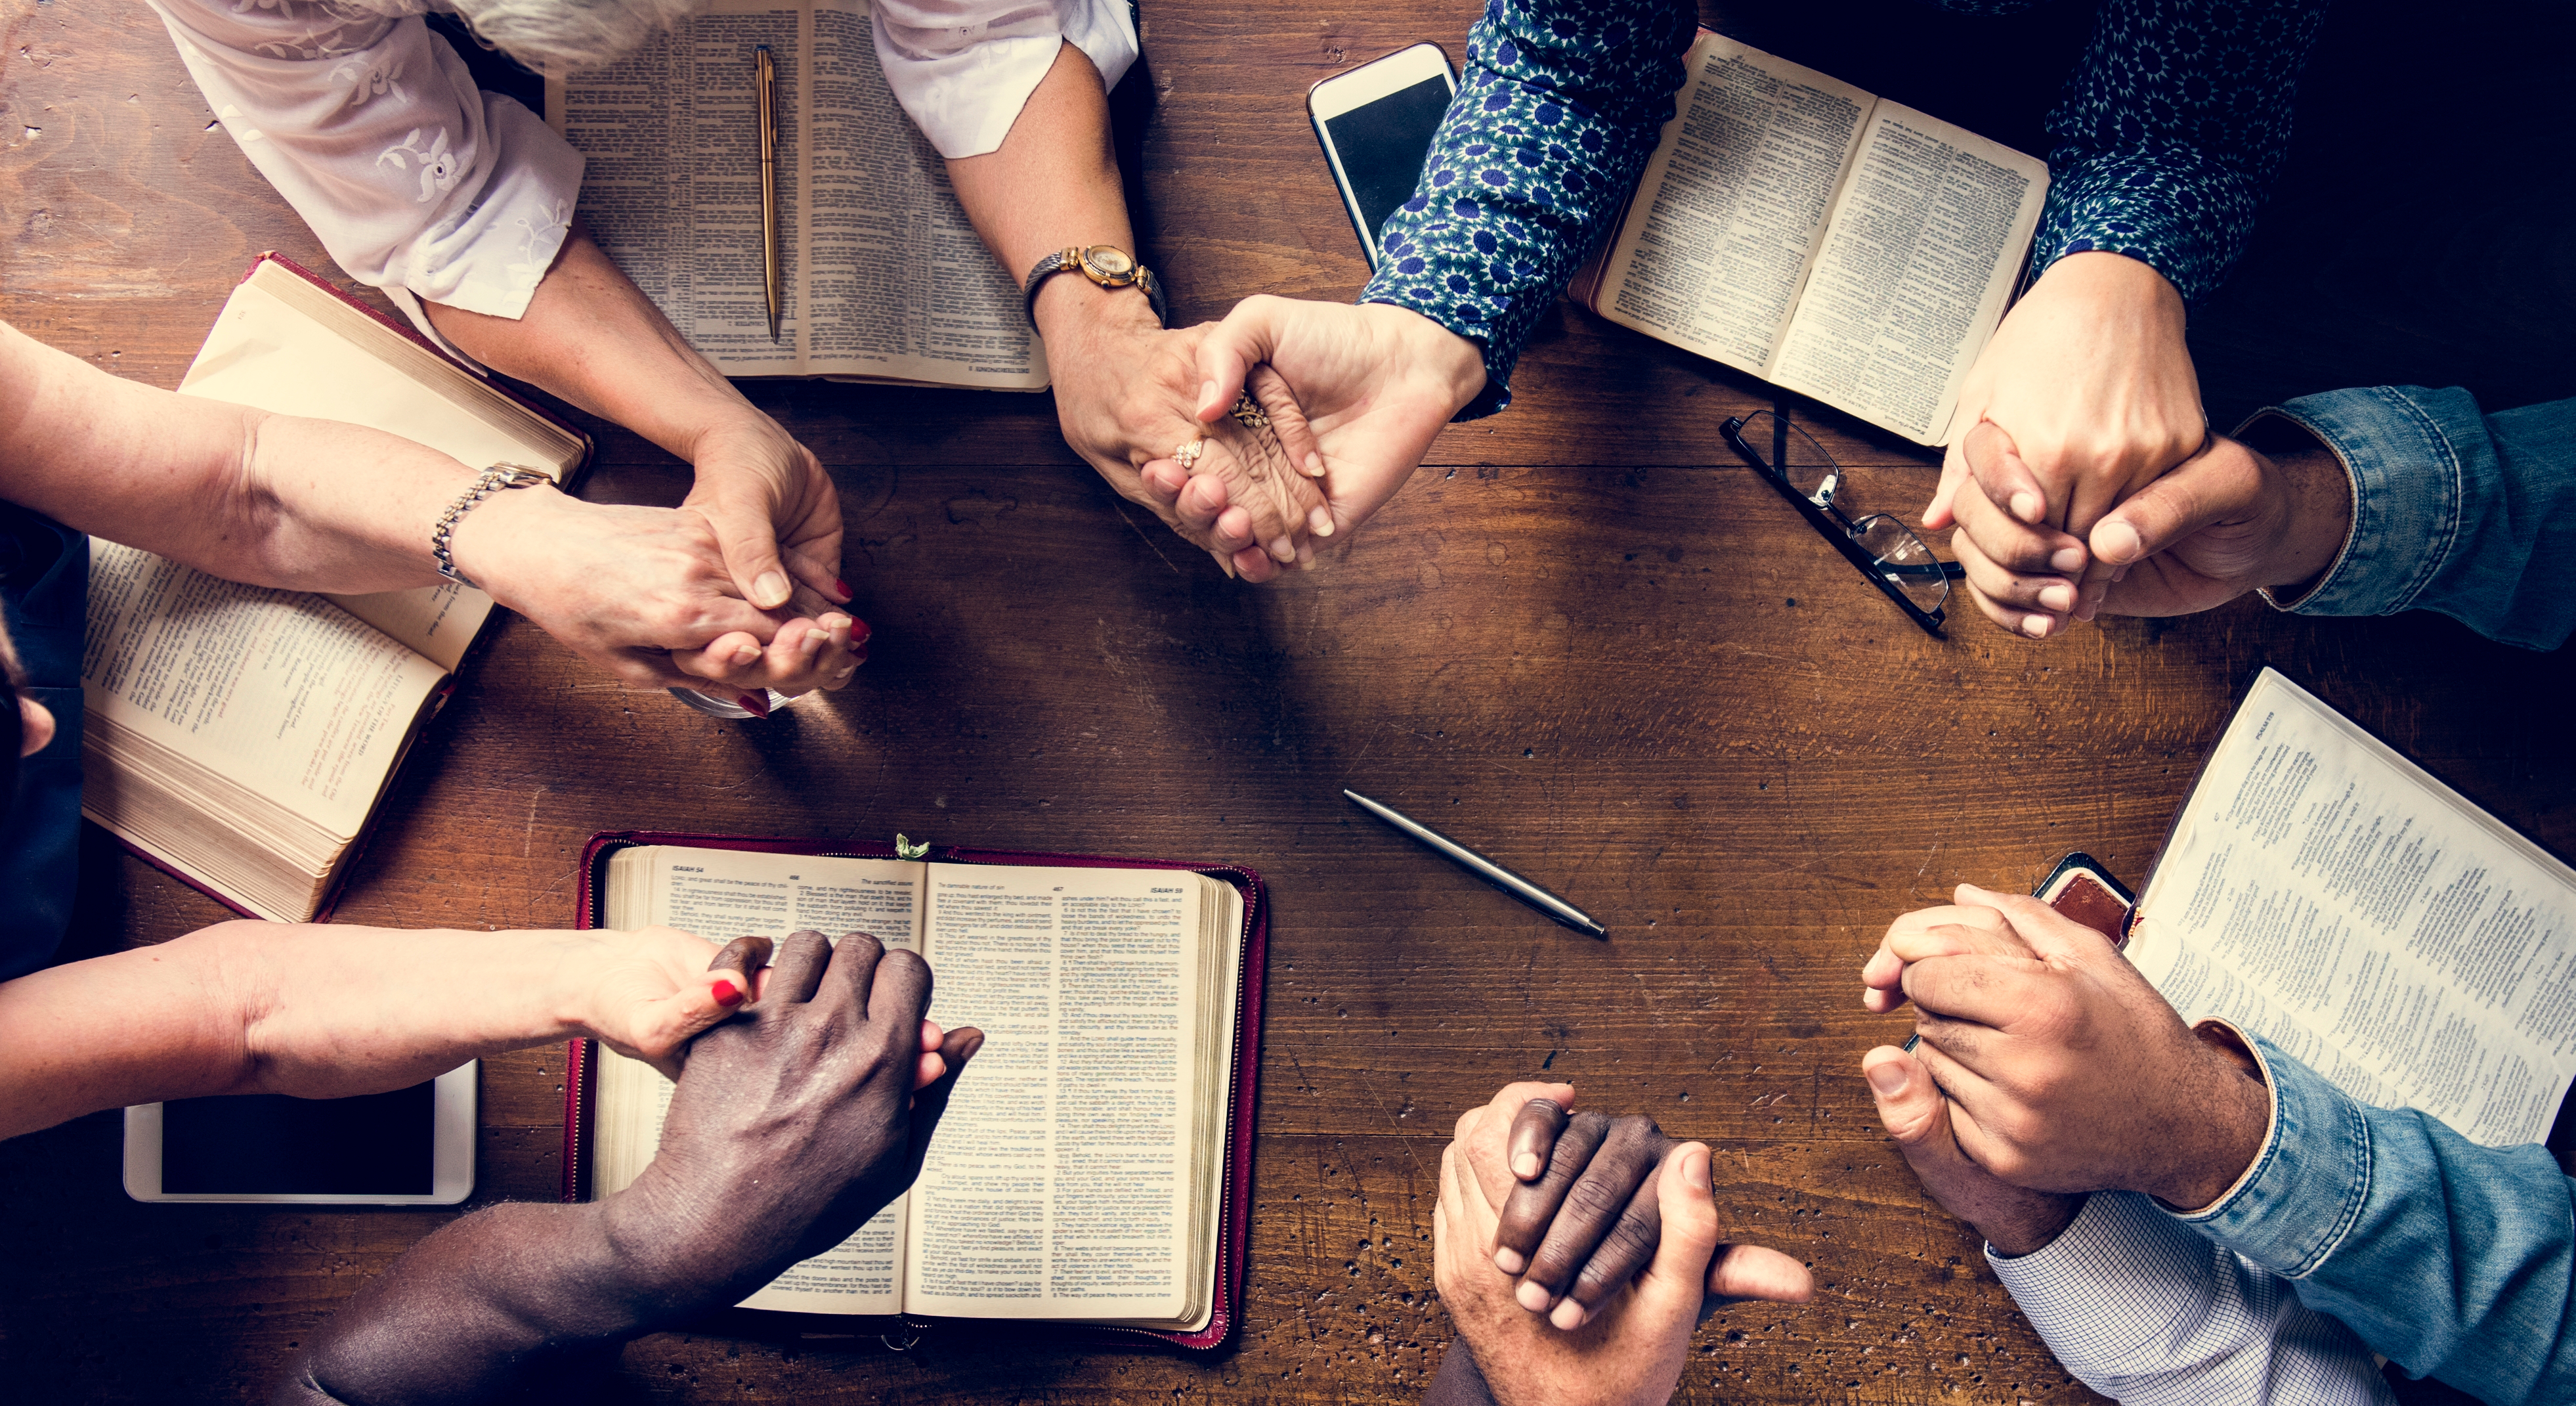 Group of people holding hands praying worship believe.jpg